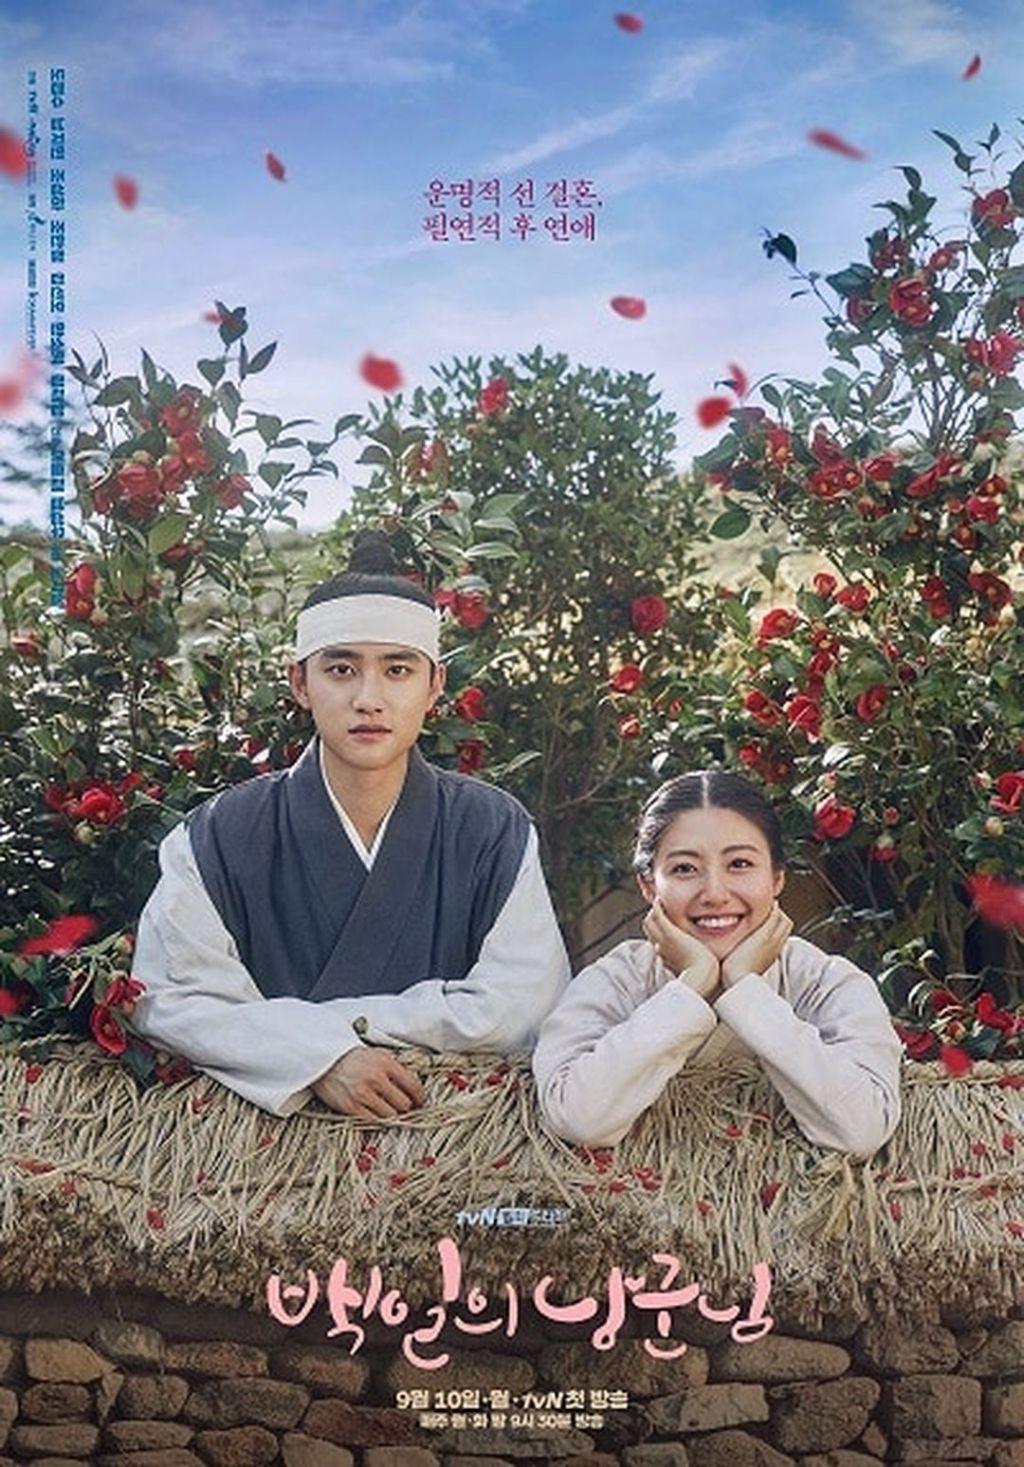 Sinopsis Dan Profil Lengkap Pemeran K-Drama Historical 100 Days My Prince (2018)